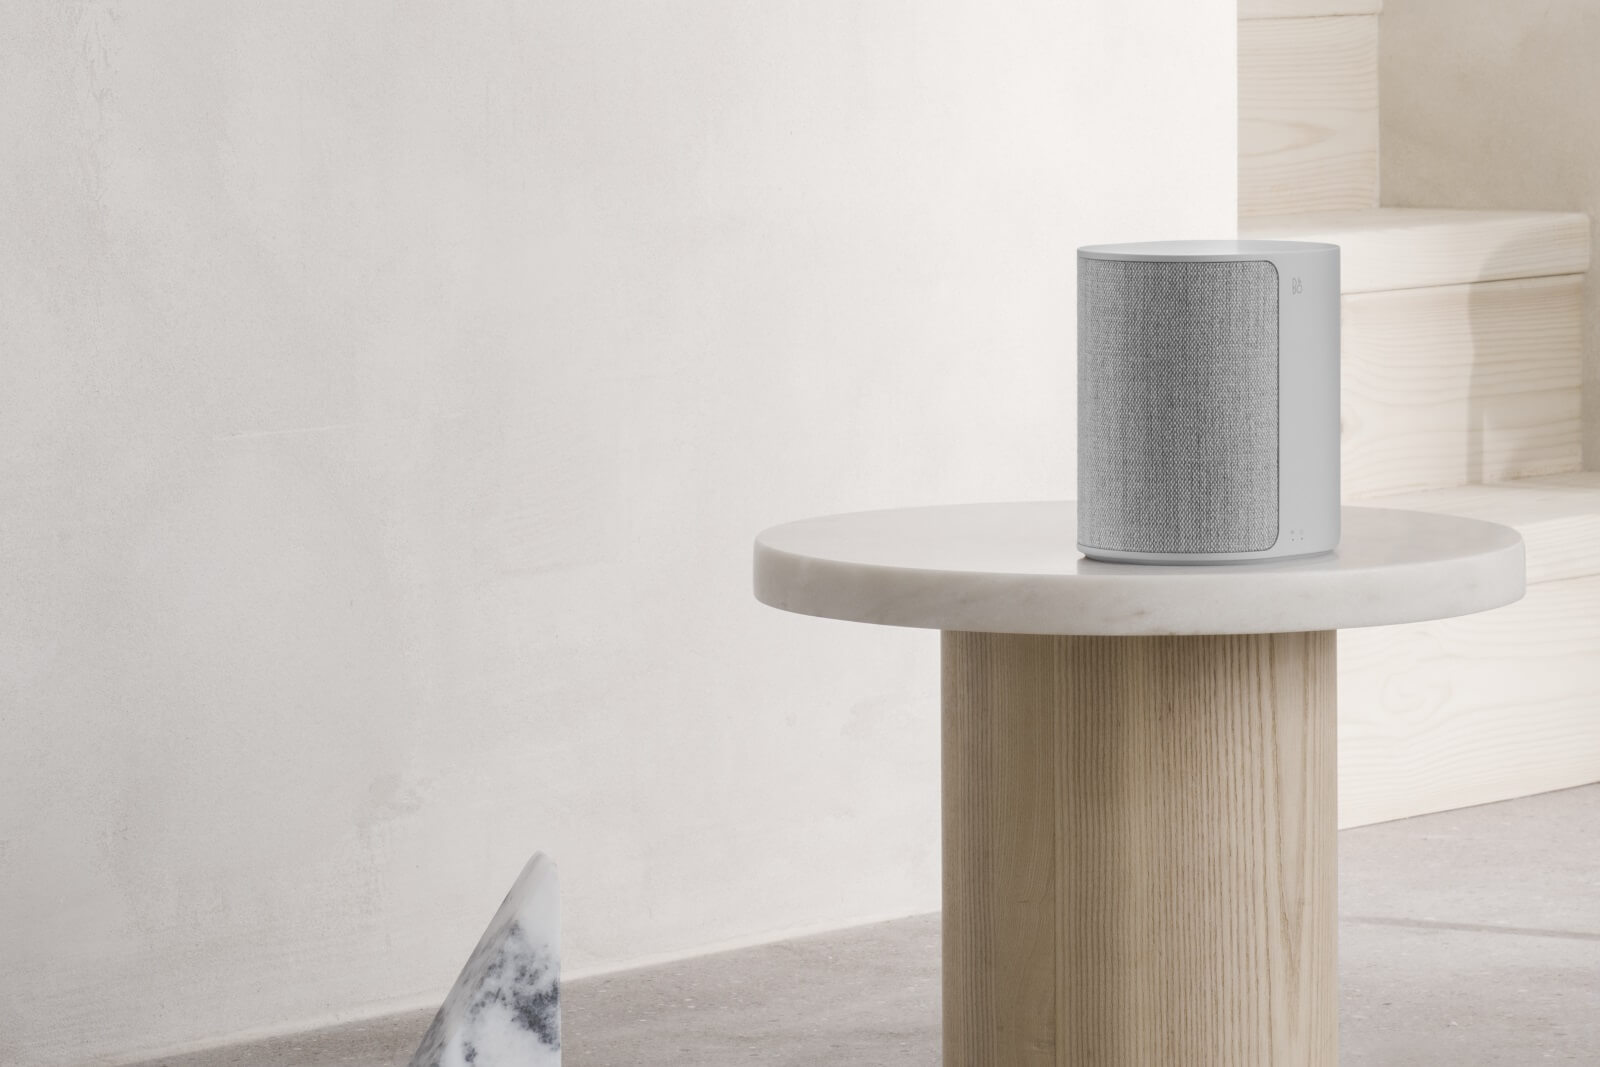 BeoPlay M3 - powerful wireless speaker